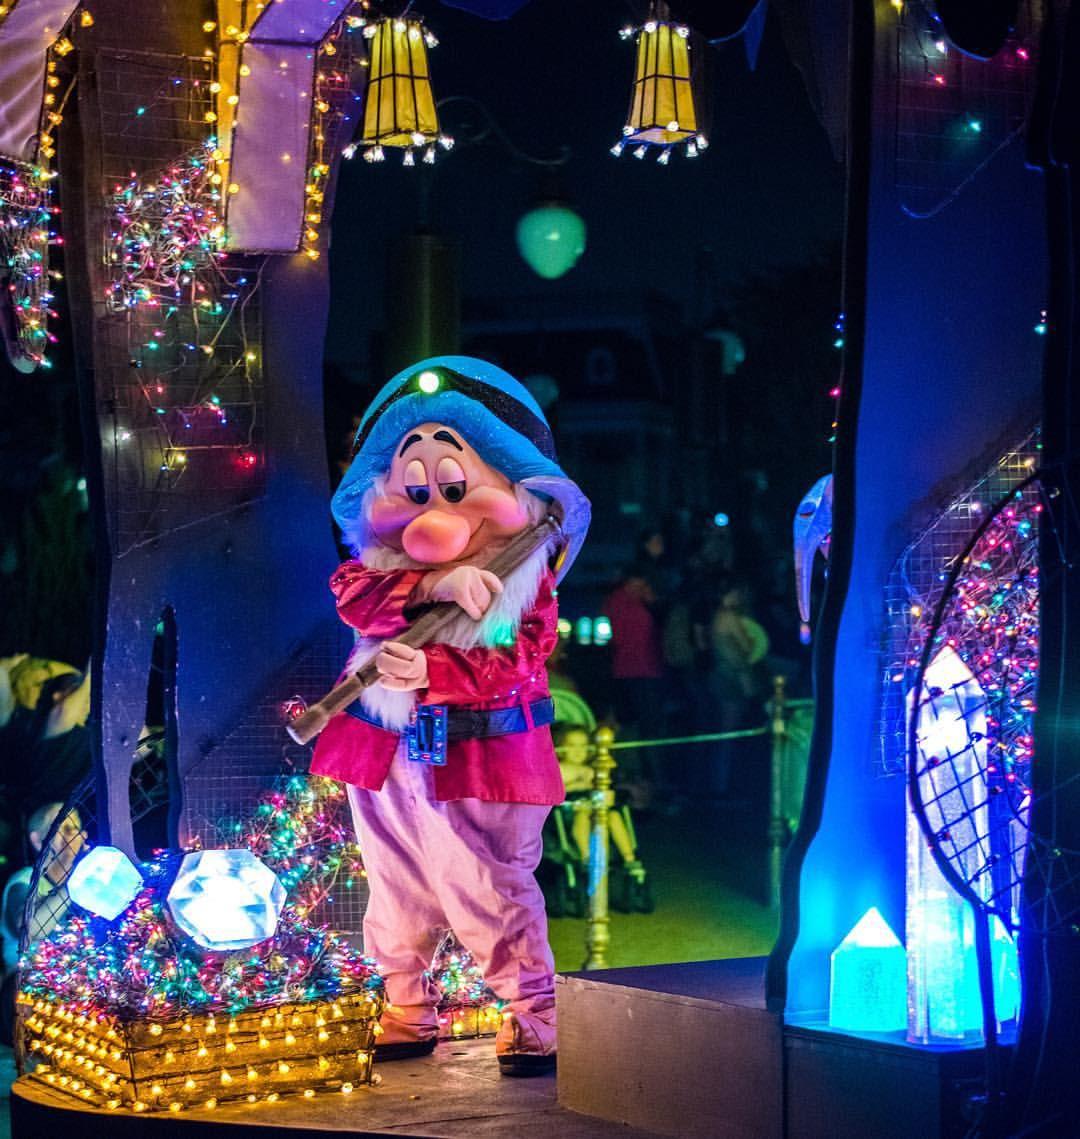 Heigh ho! #Disney #wdw #disneyworld #waltdisneyworld #disneyparks #disneygram #disneyside #magickingdom #mainstreetelectricalparade